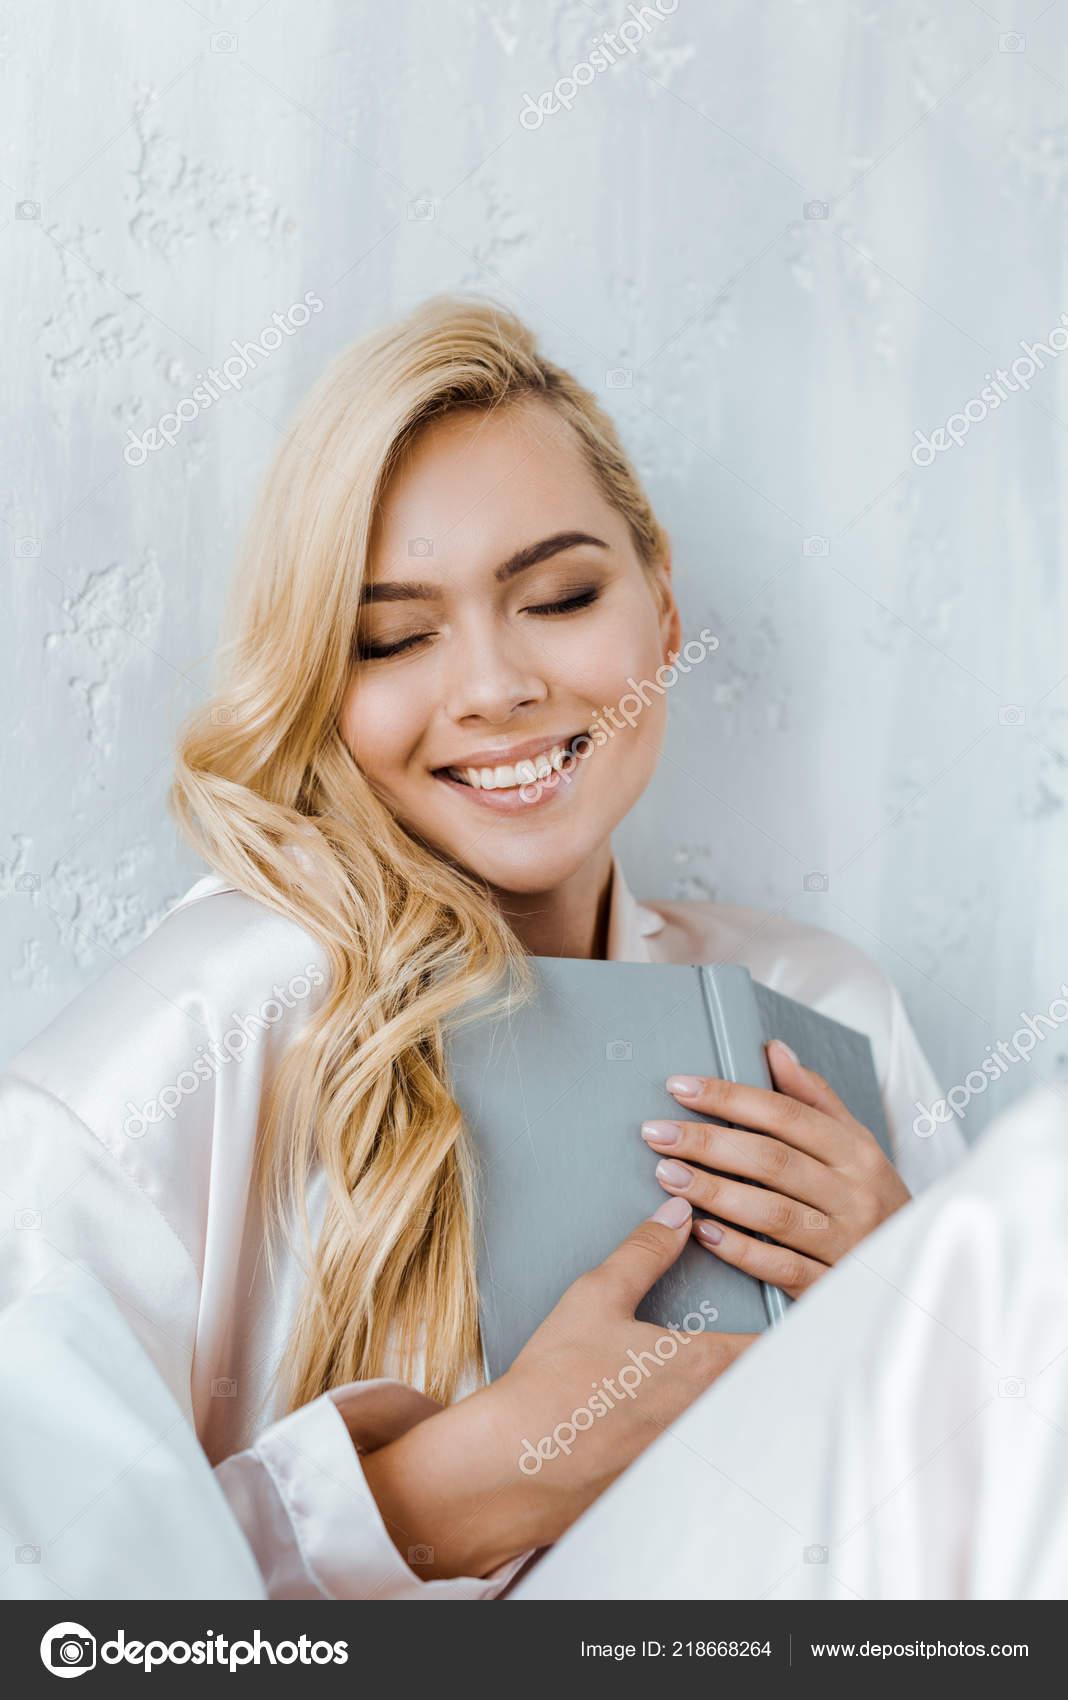 blondinki-v-pizhame-foto